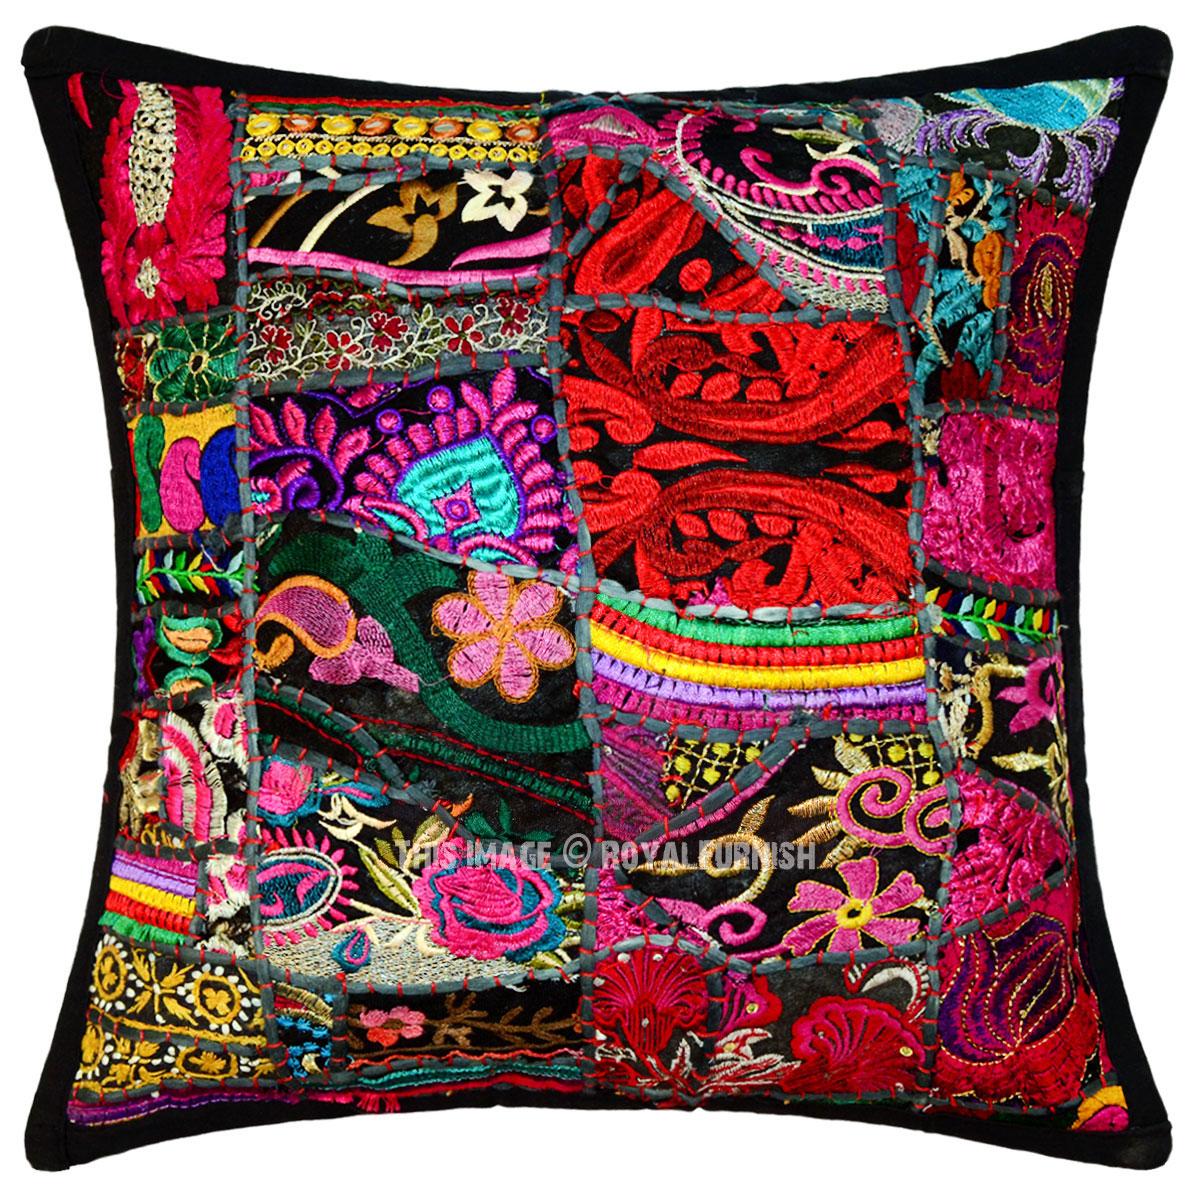 Black Outdoor Indoor Bohemian Patchwork Throw Pillow Cover